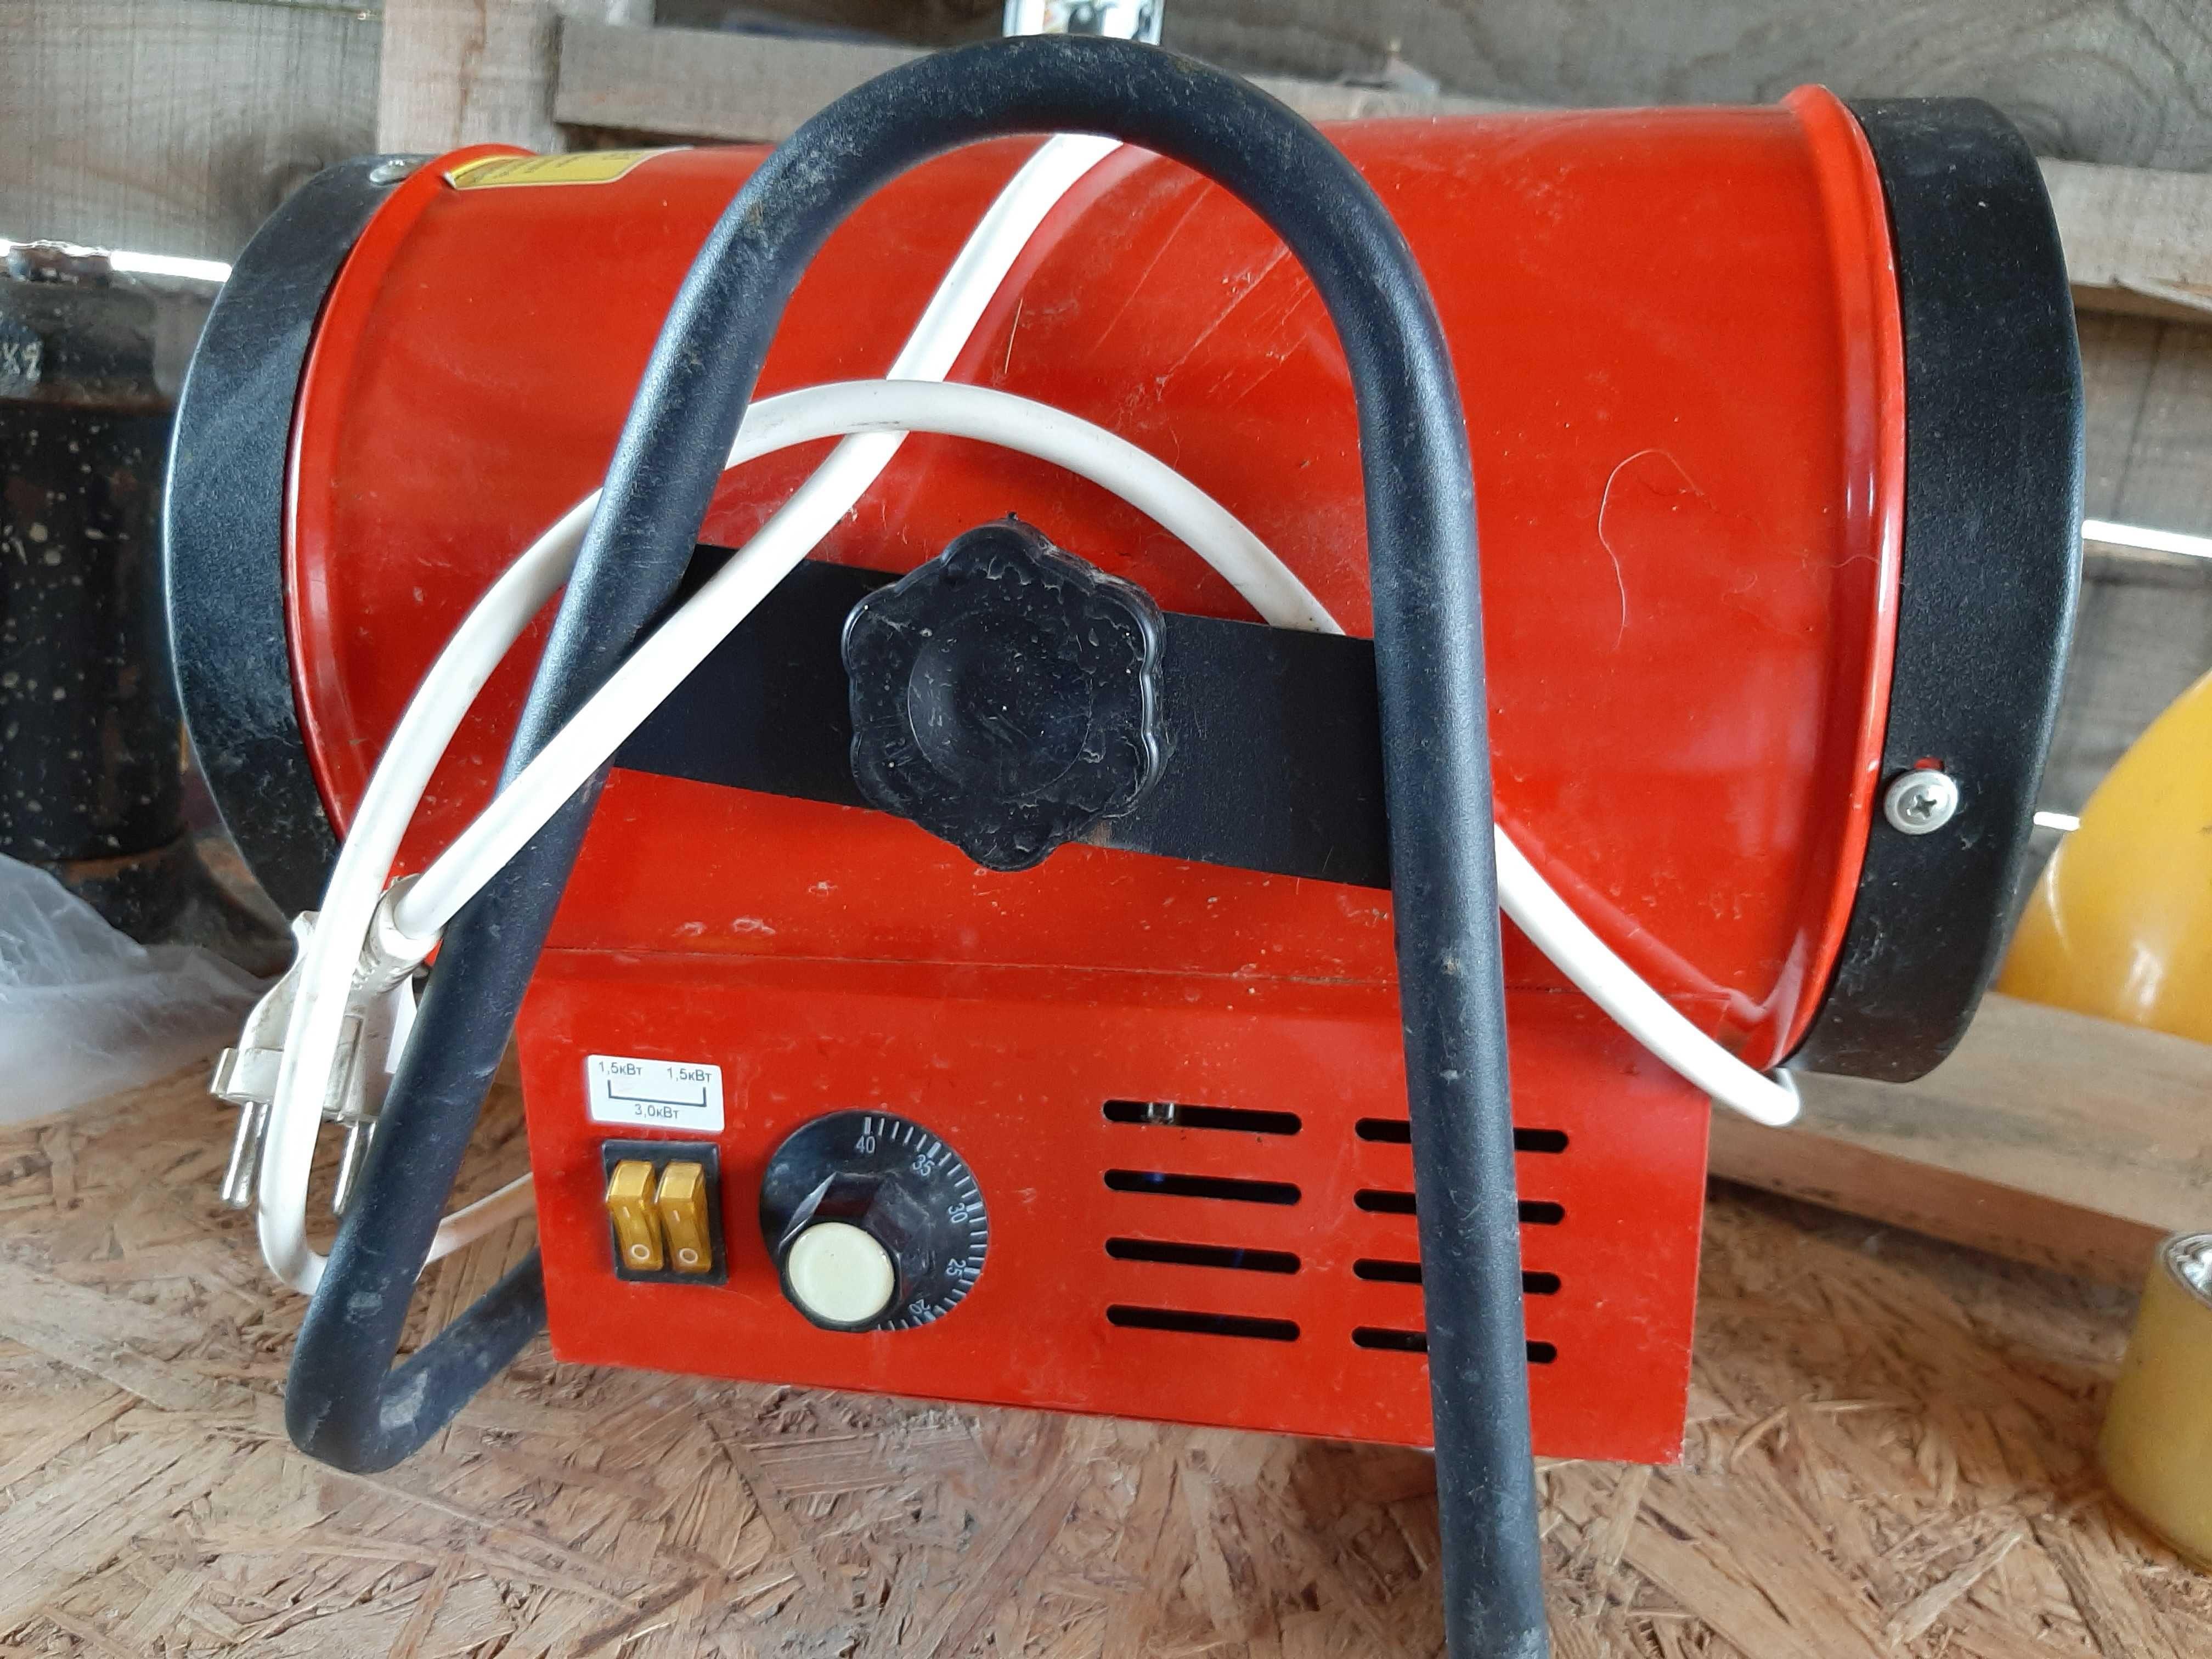 Тепловая пушка (электрокалорифер) 3 кВт.